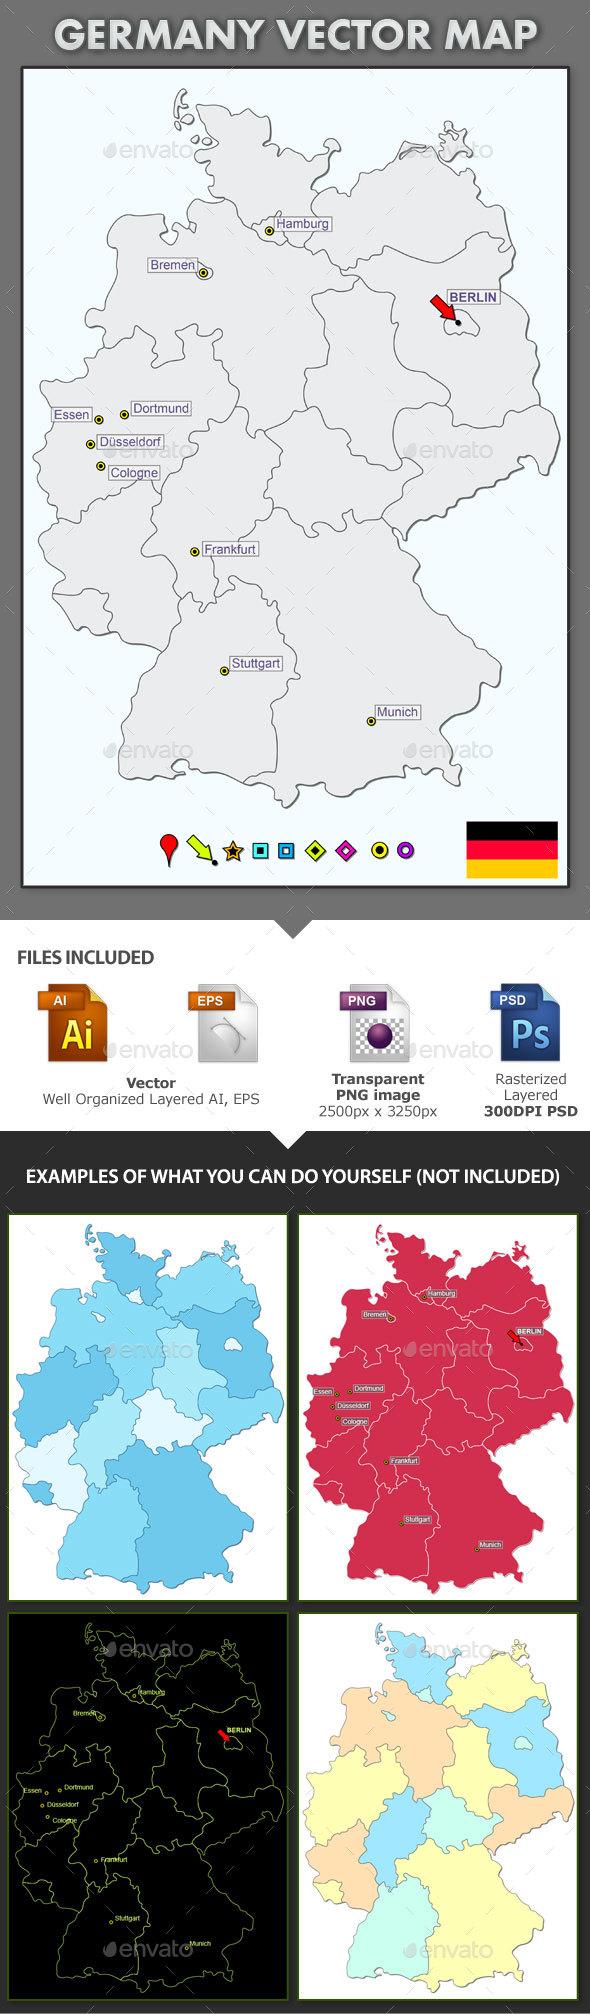 Germany Layered Vector Map - Web Elements Vectors